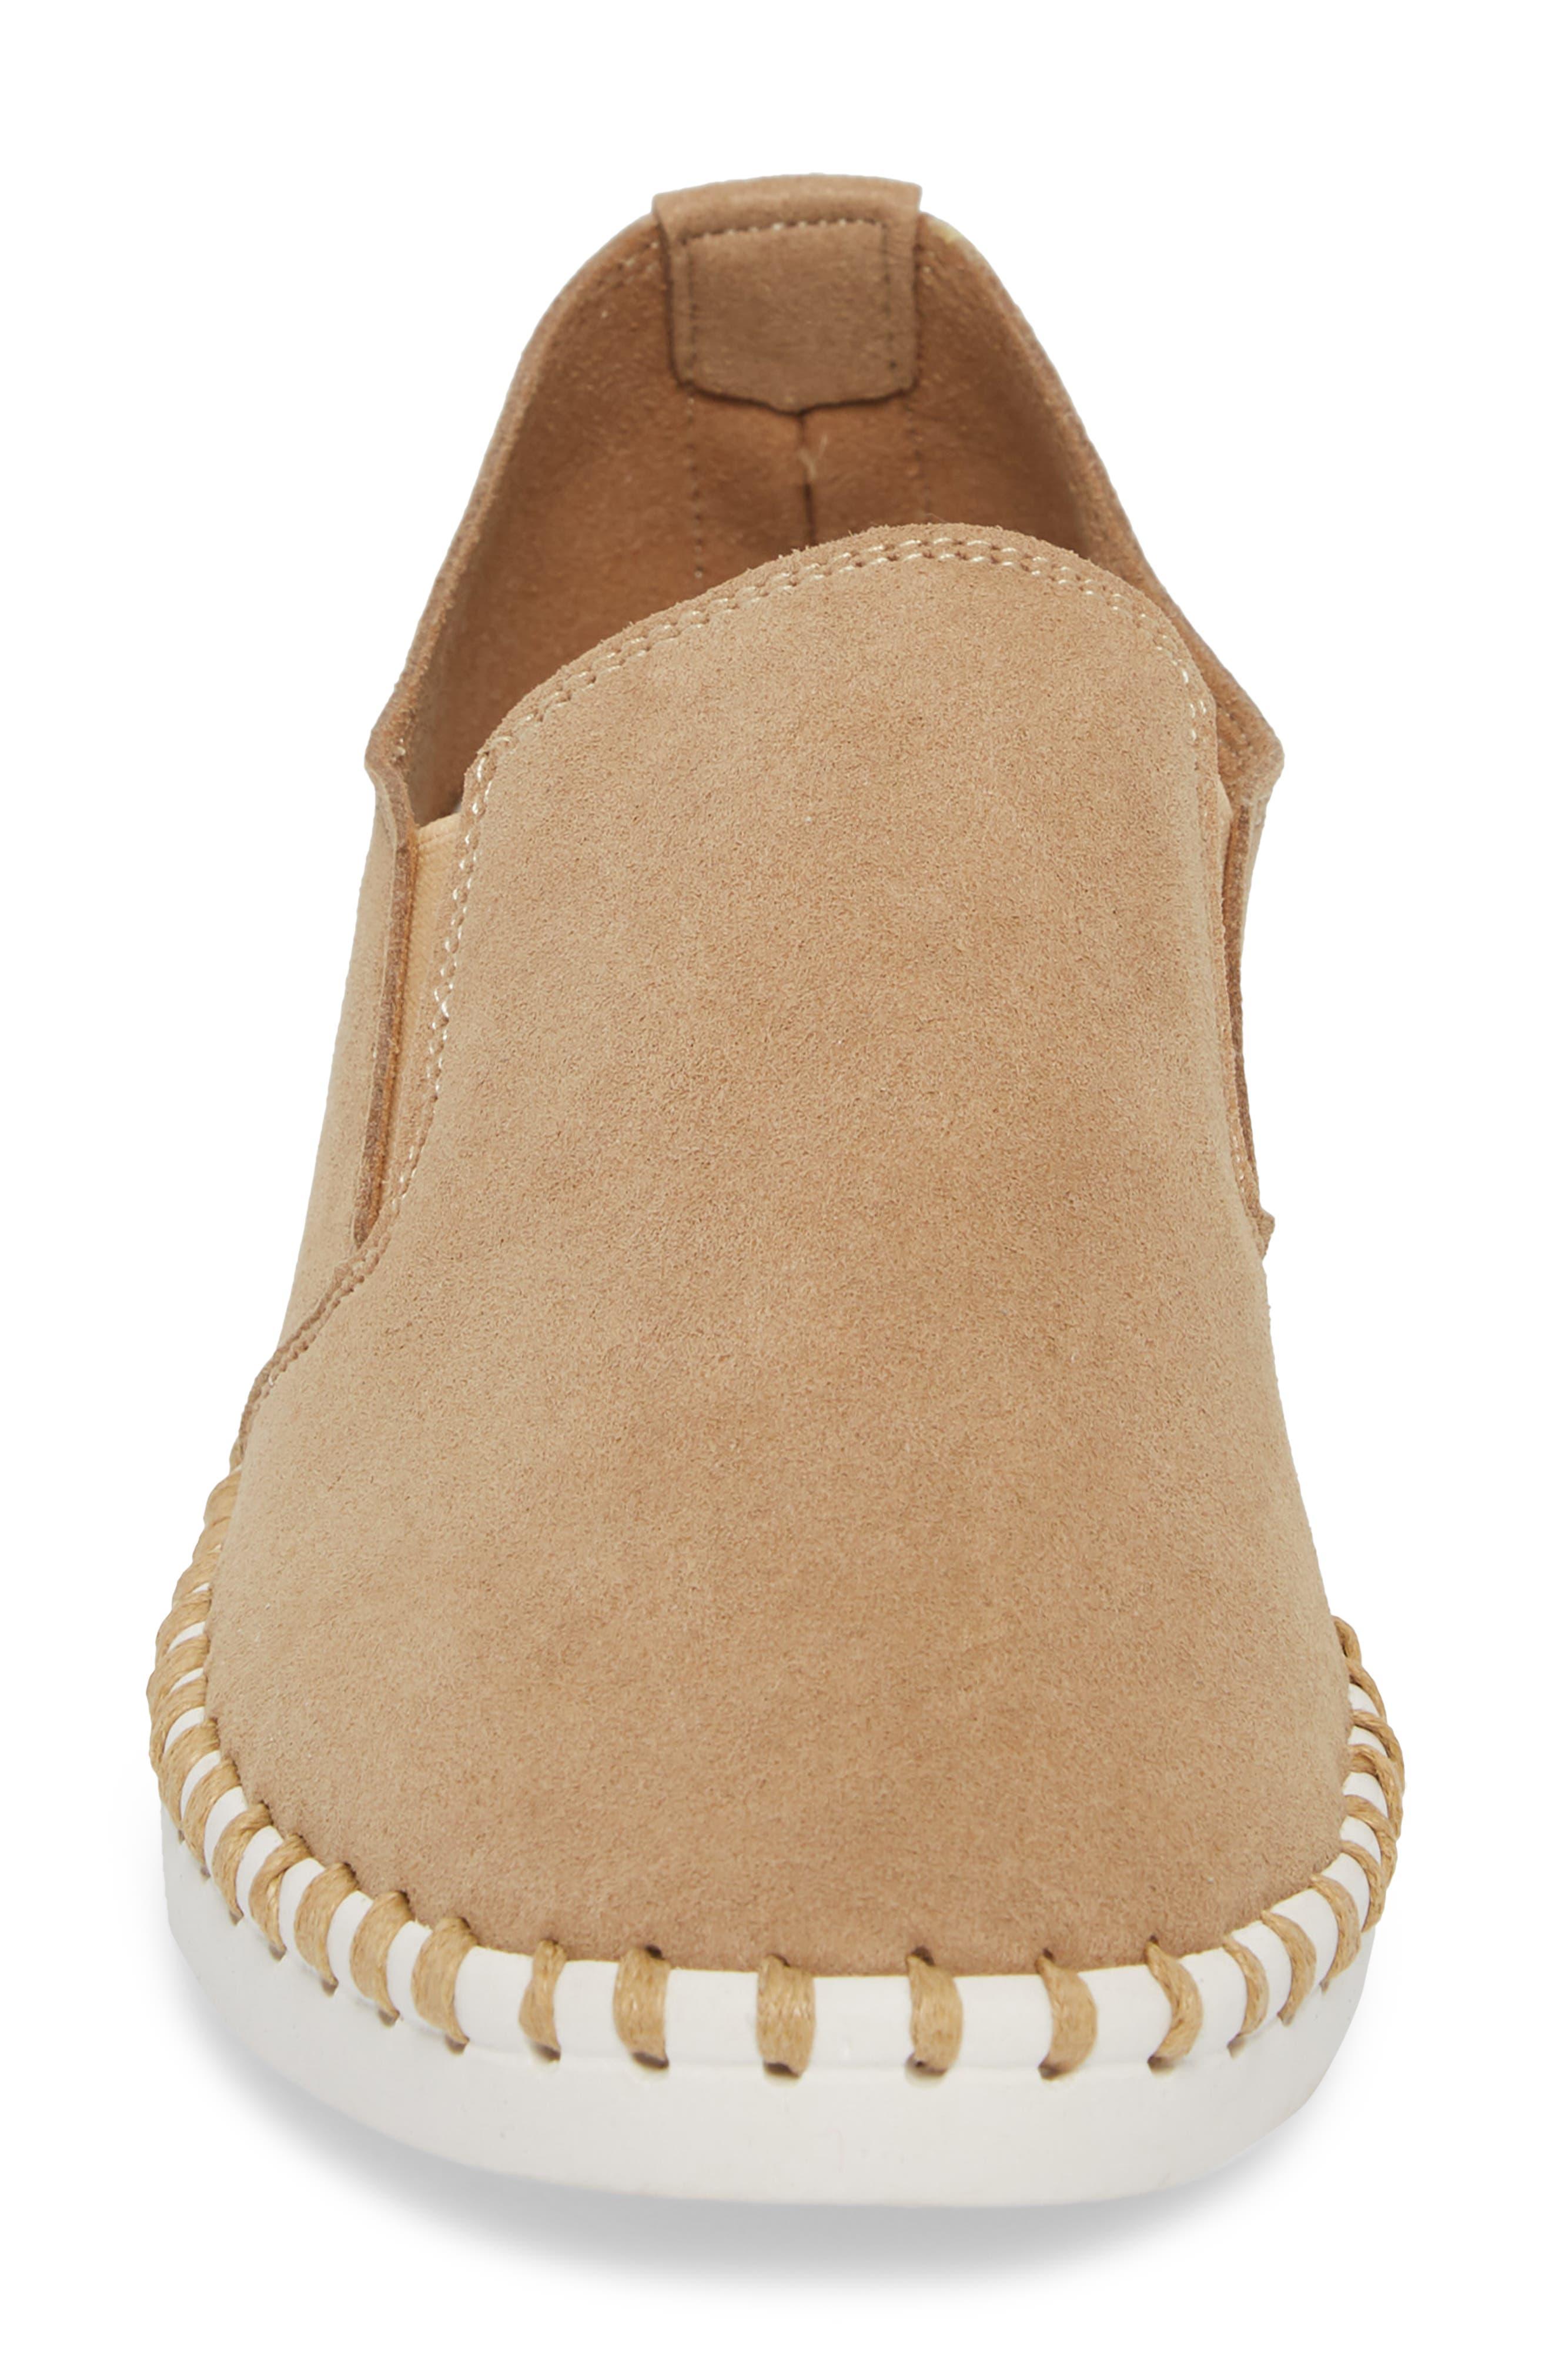 Salinas Waterproof Slip-On Sneaker,                             Alternate thumbnail 4, color,                             Tan Fabric